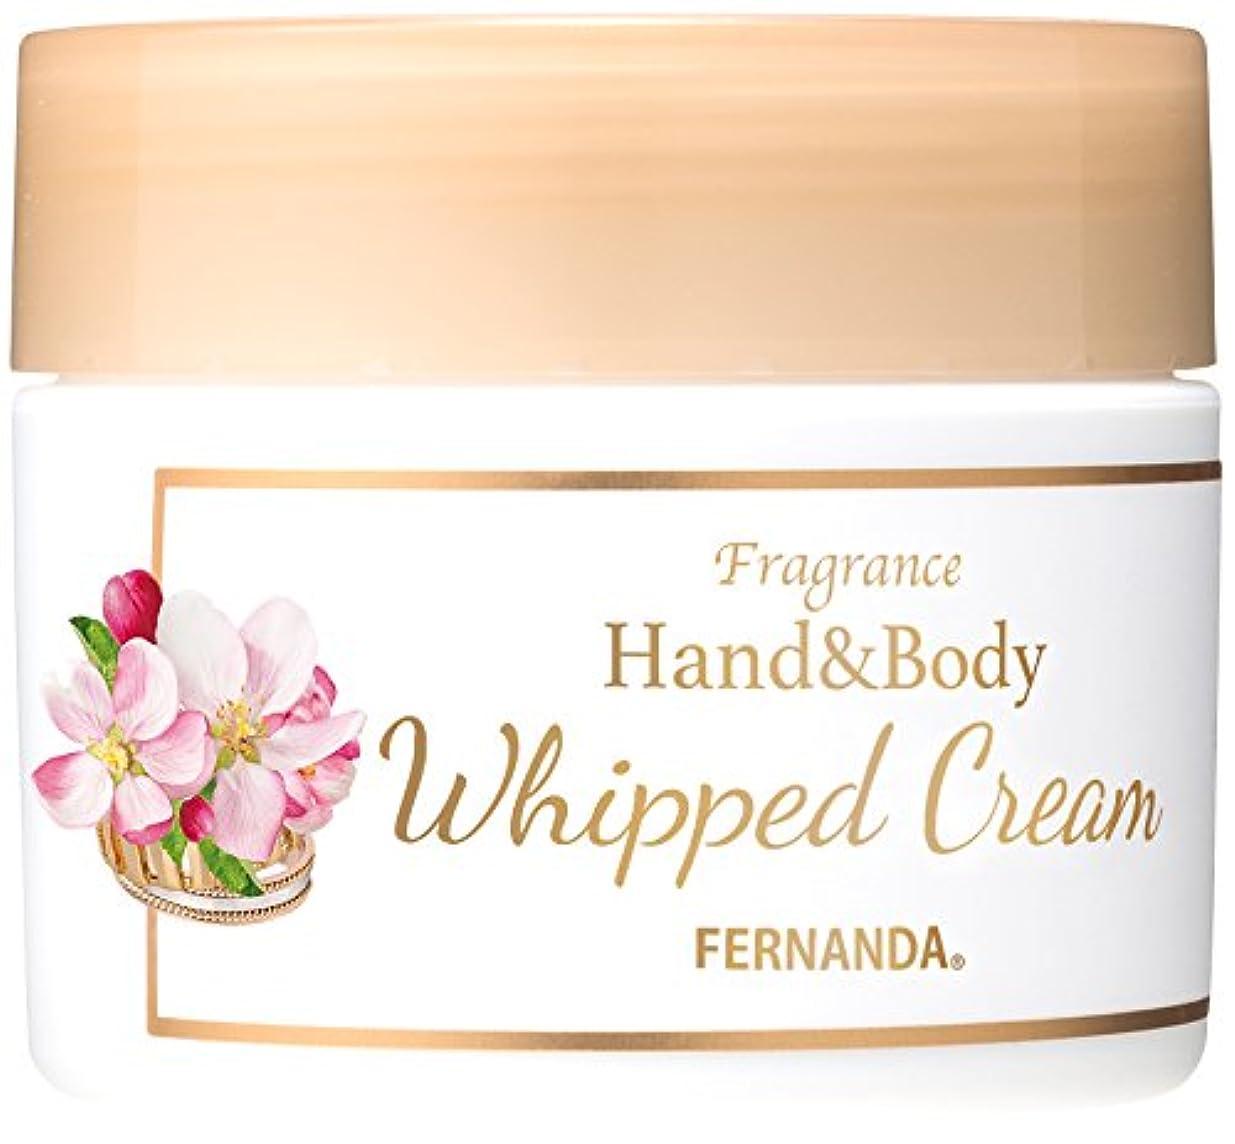 FERNANDA(フェルナンダ) Hand&Body Whipped Cream Primeiro Amor (ハンド&ホイップクリーム プリメイロアモール)